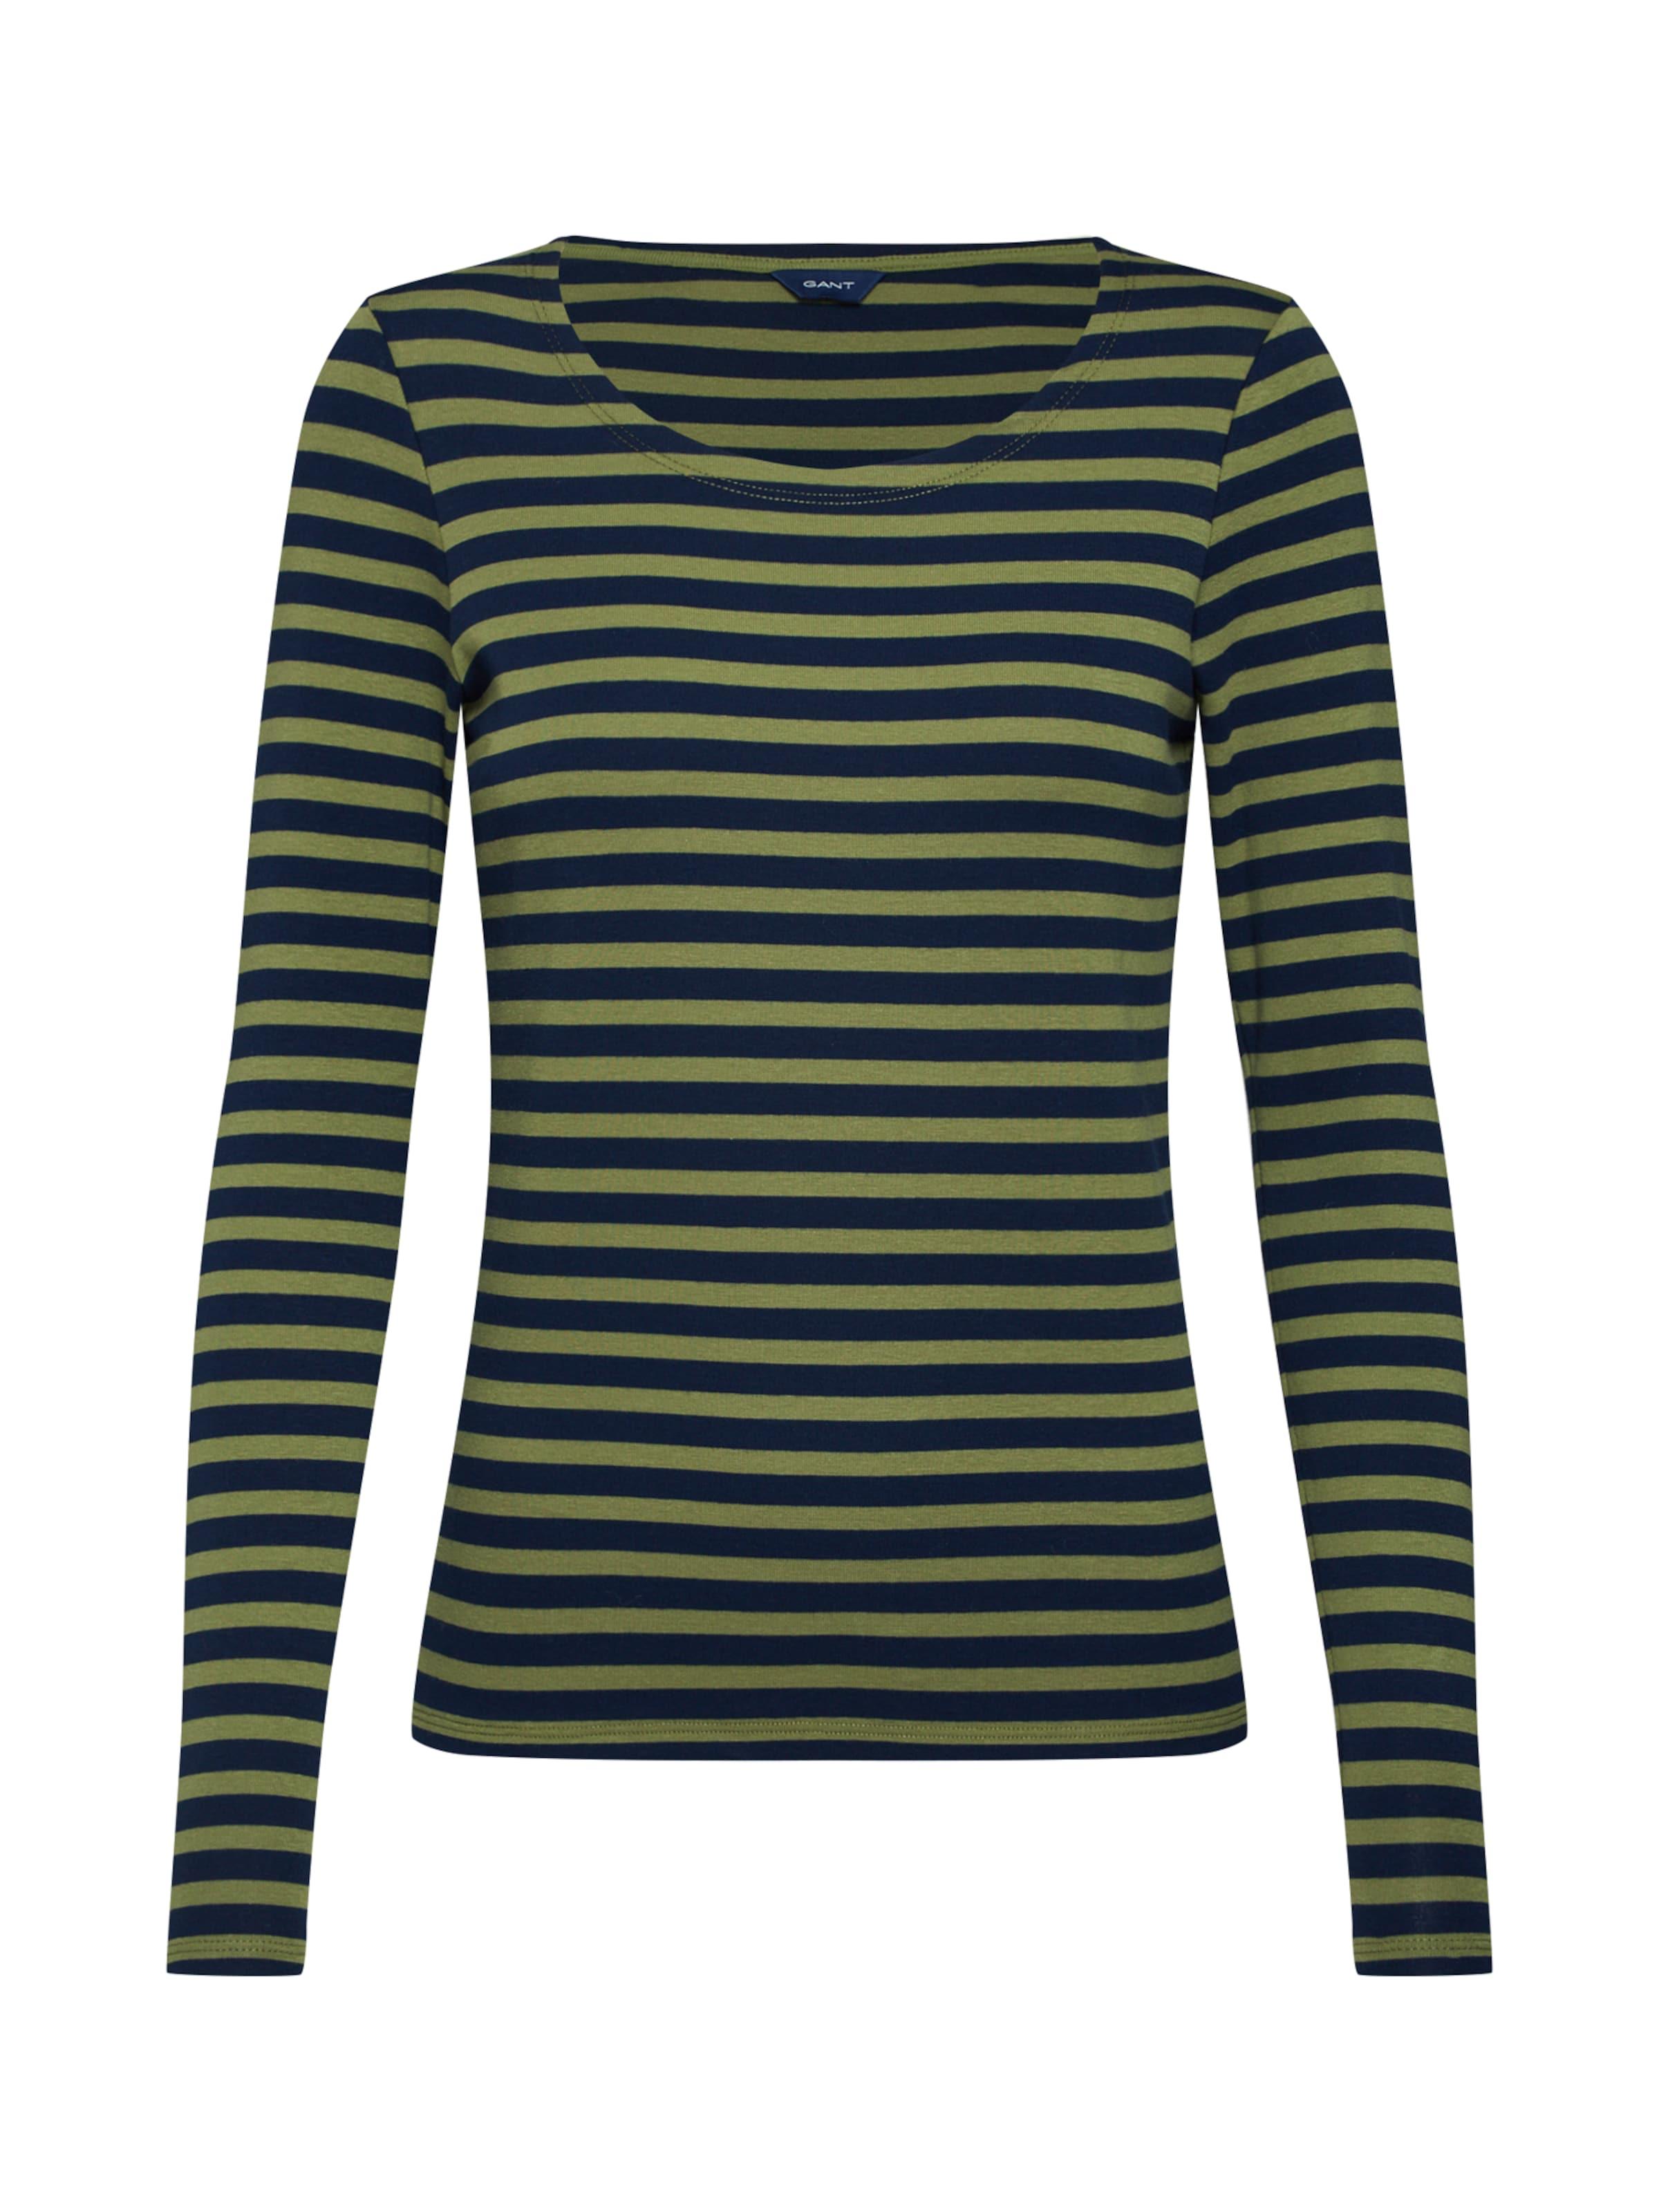 Shirt T In Rib Gant Ls '1x1 CremeGrün shirt' 3ALScRq54j